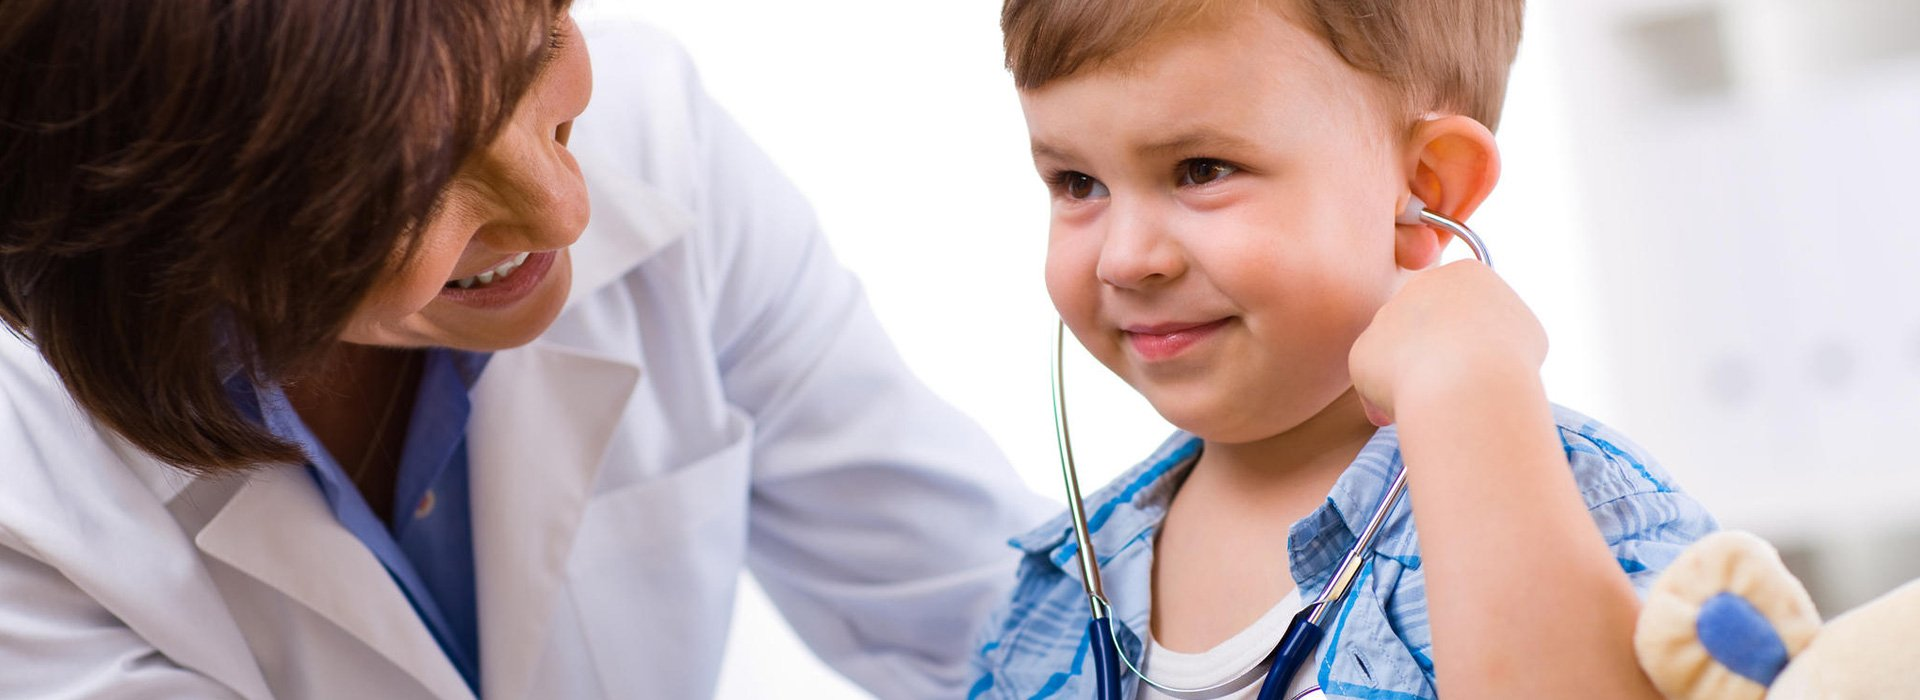 Arbeta som läkare